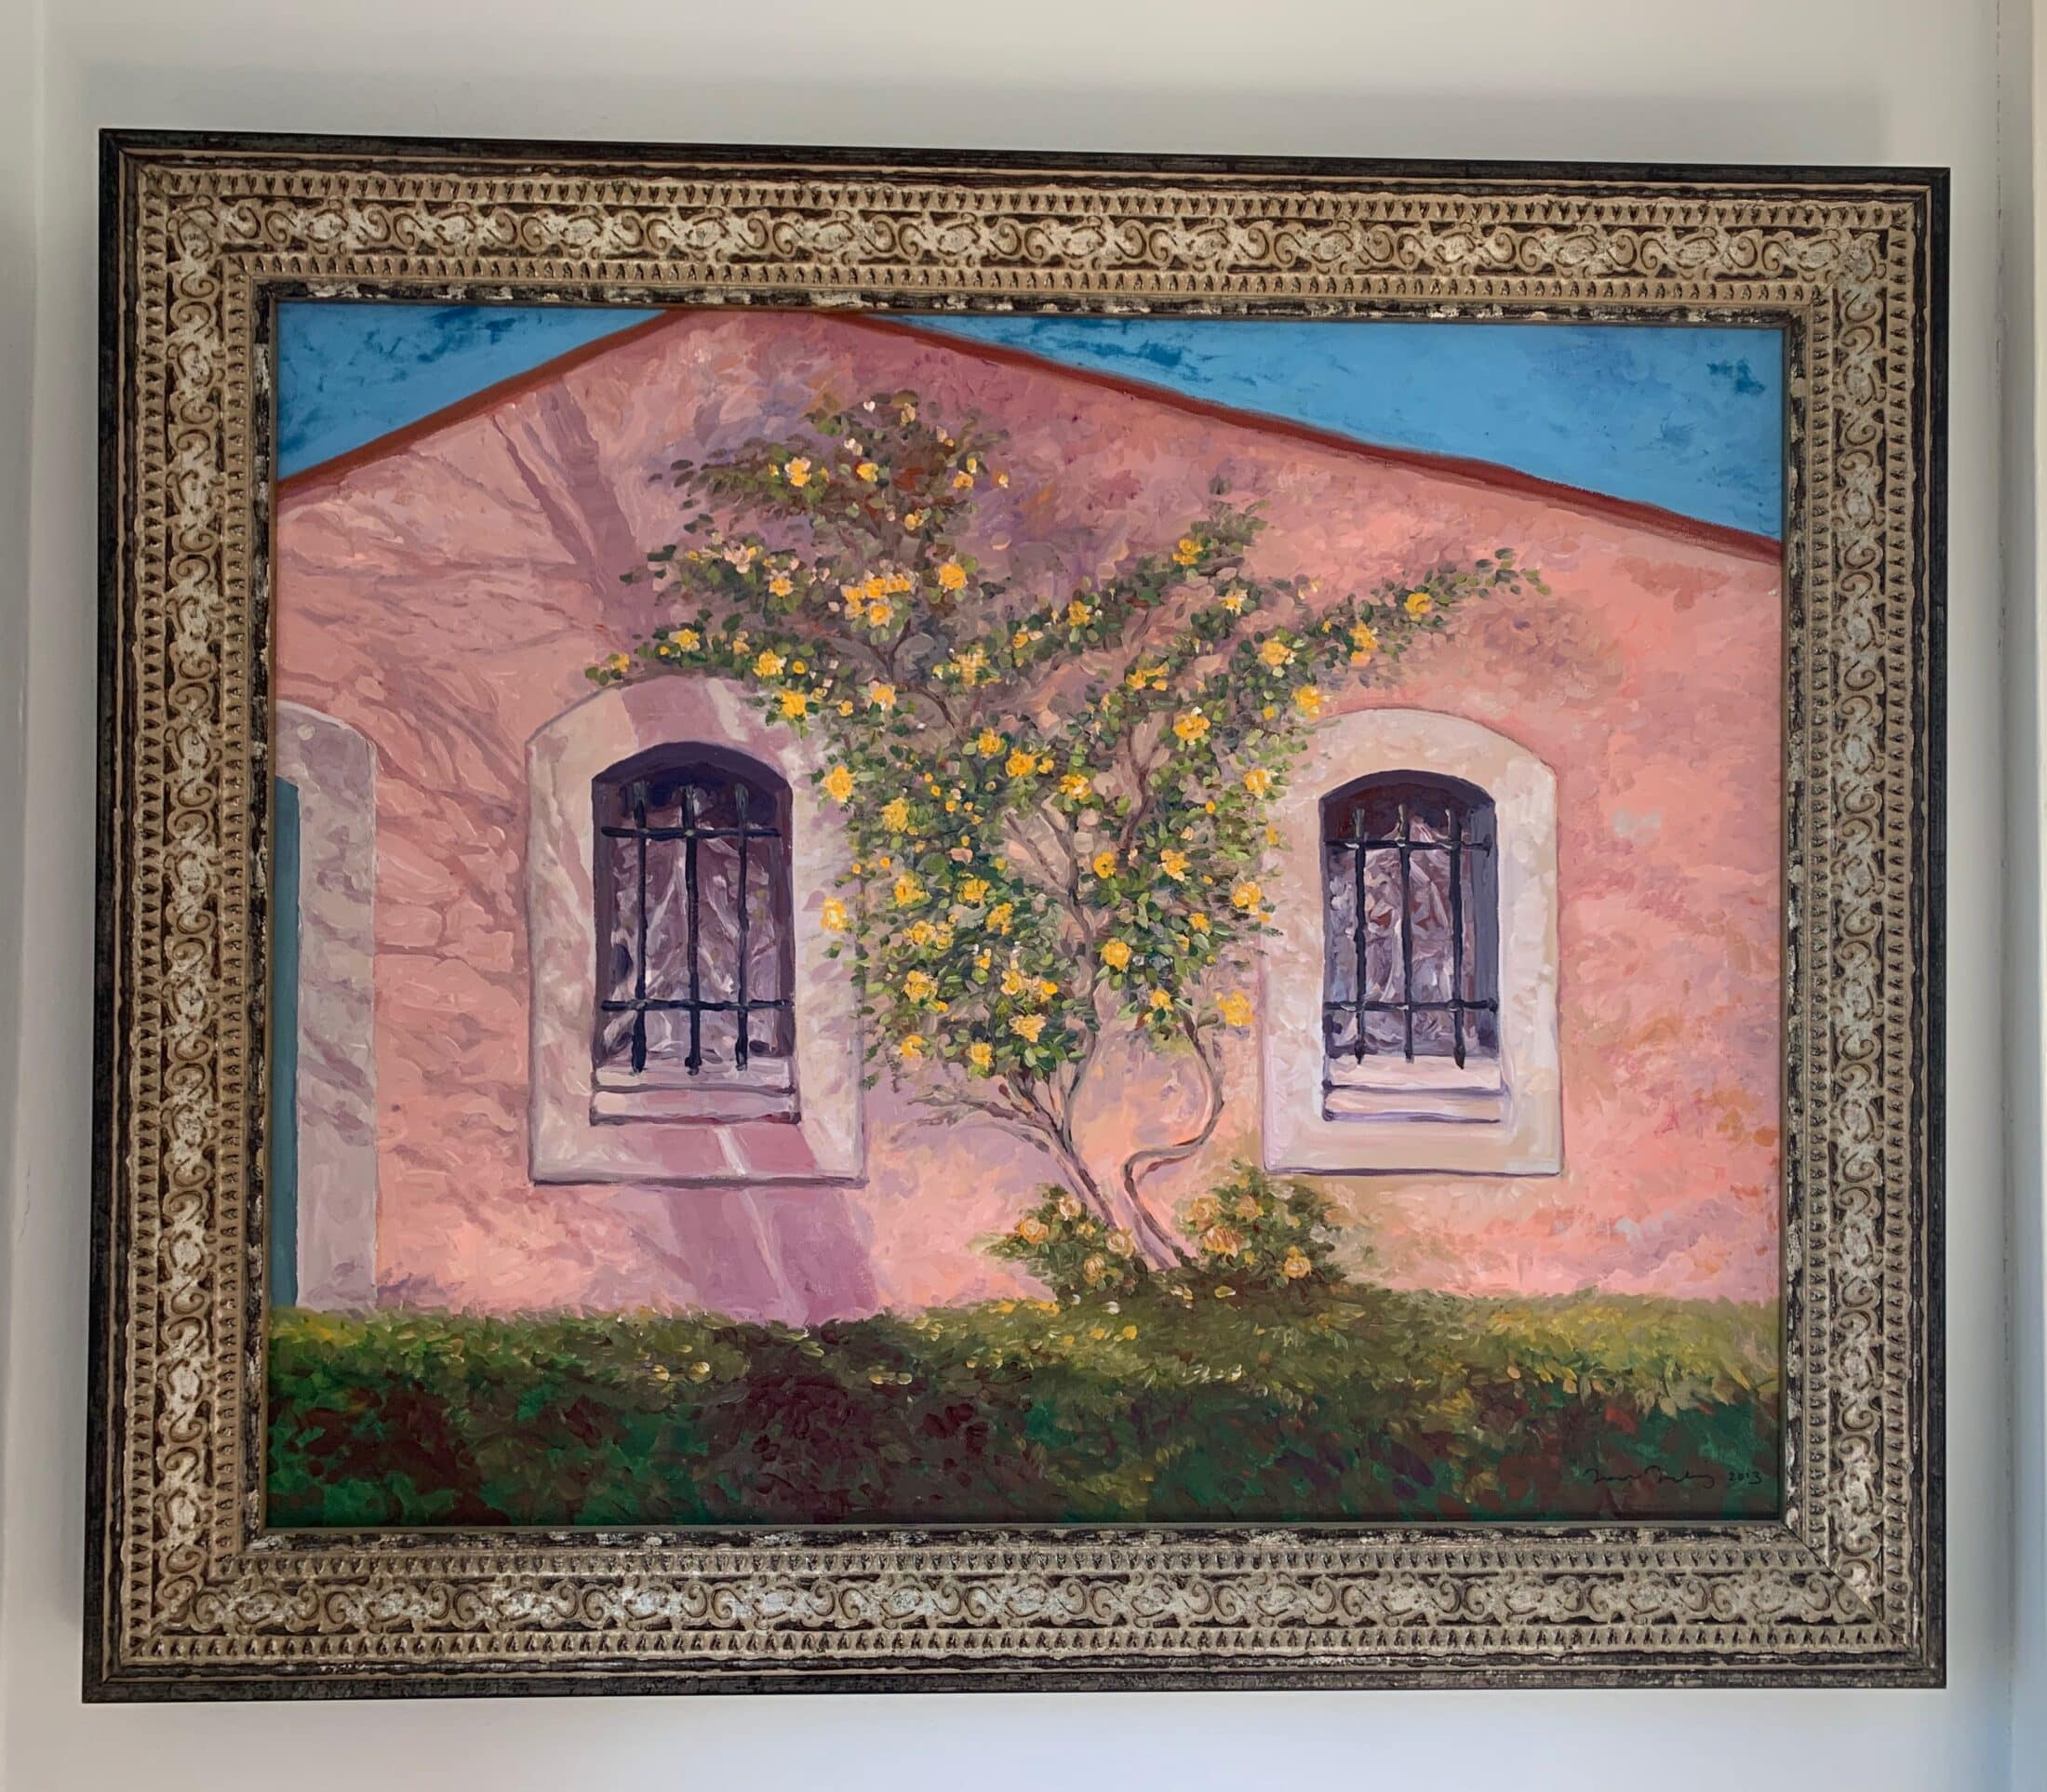 ART SPOTLIGHT: LA PETITE COLLINE DE ROUSSILLON, The Applewood Manor